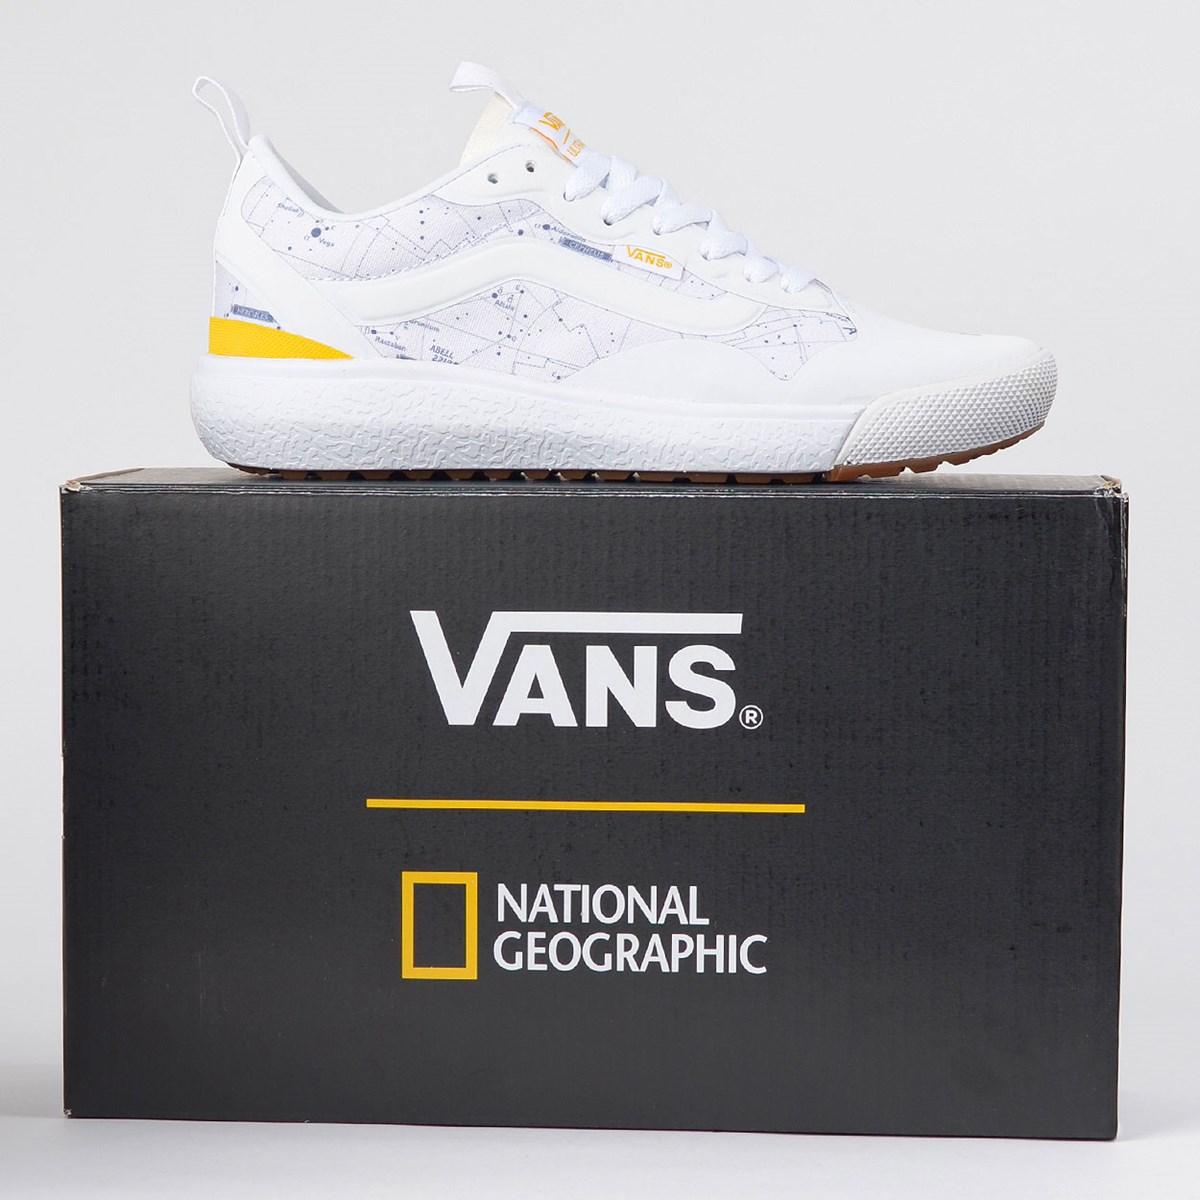 Tênis Vans Ultrarange Exo National Geographic White Yellow VN0A4U1KXU4